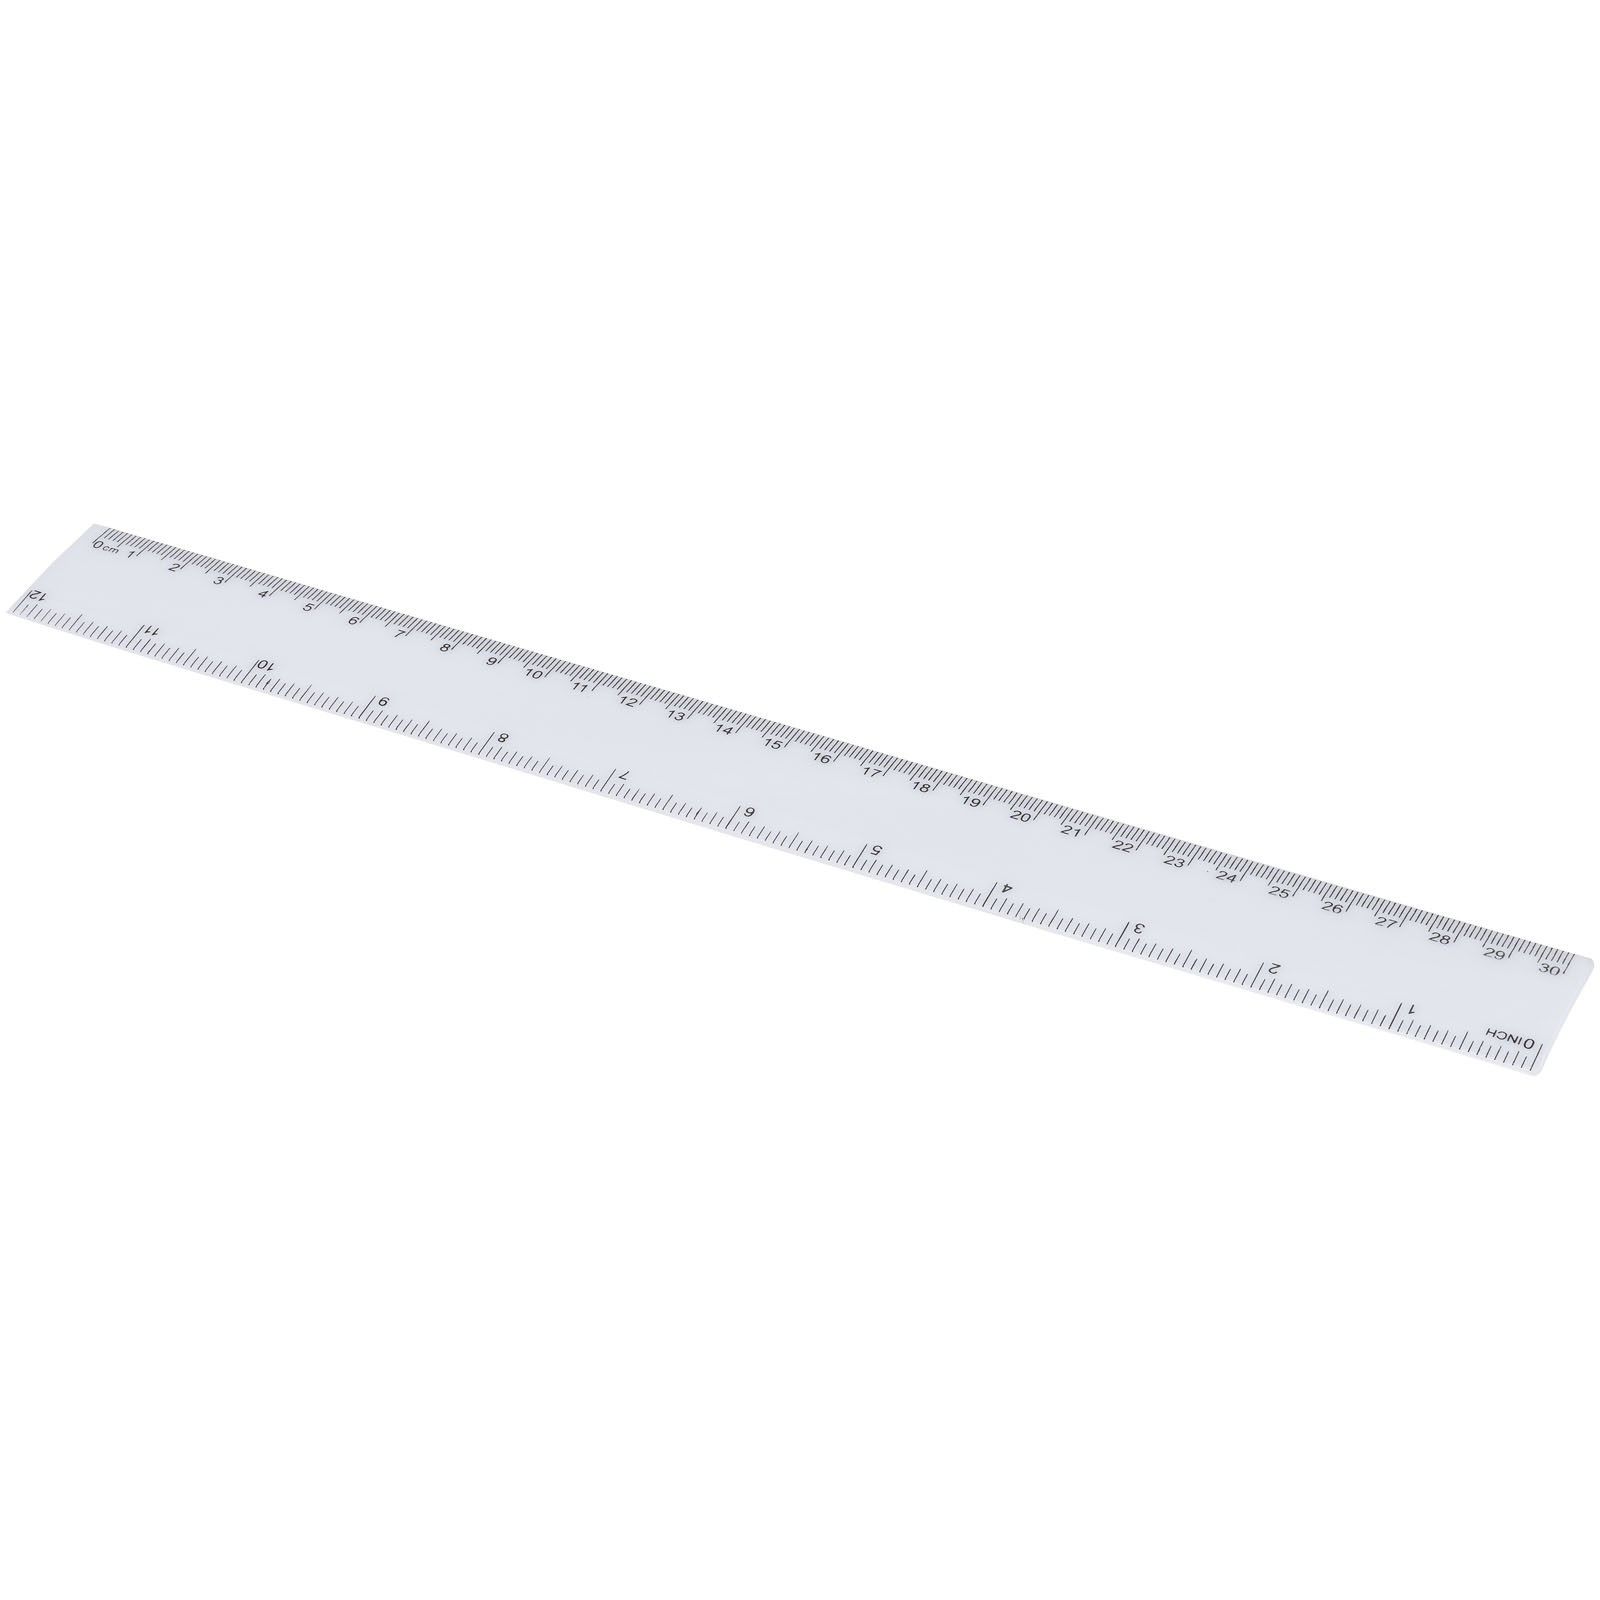 Ruly ruler 30 cm - White